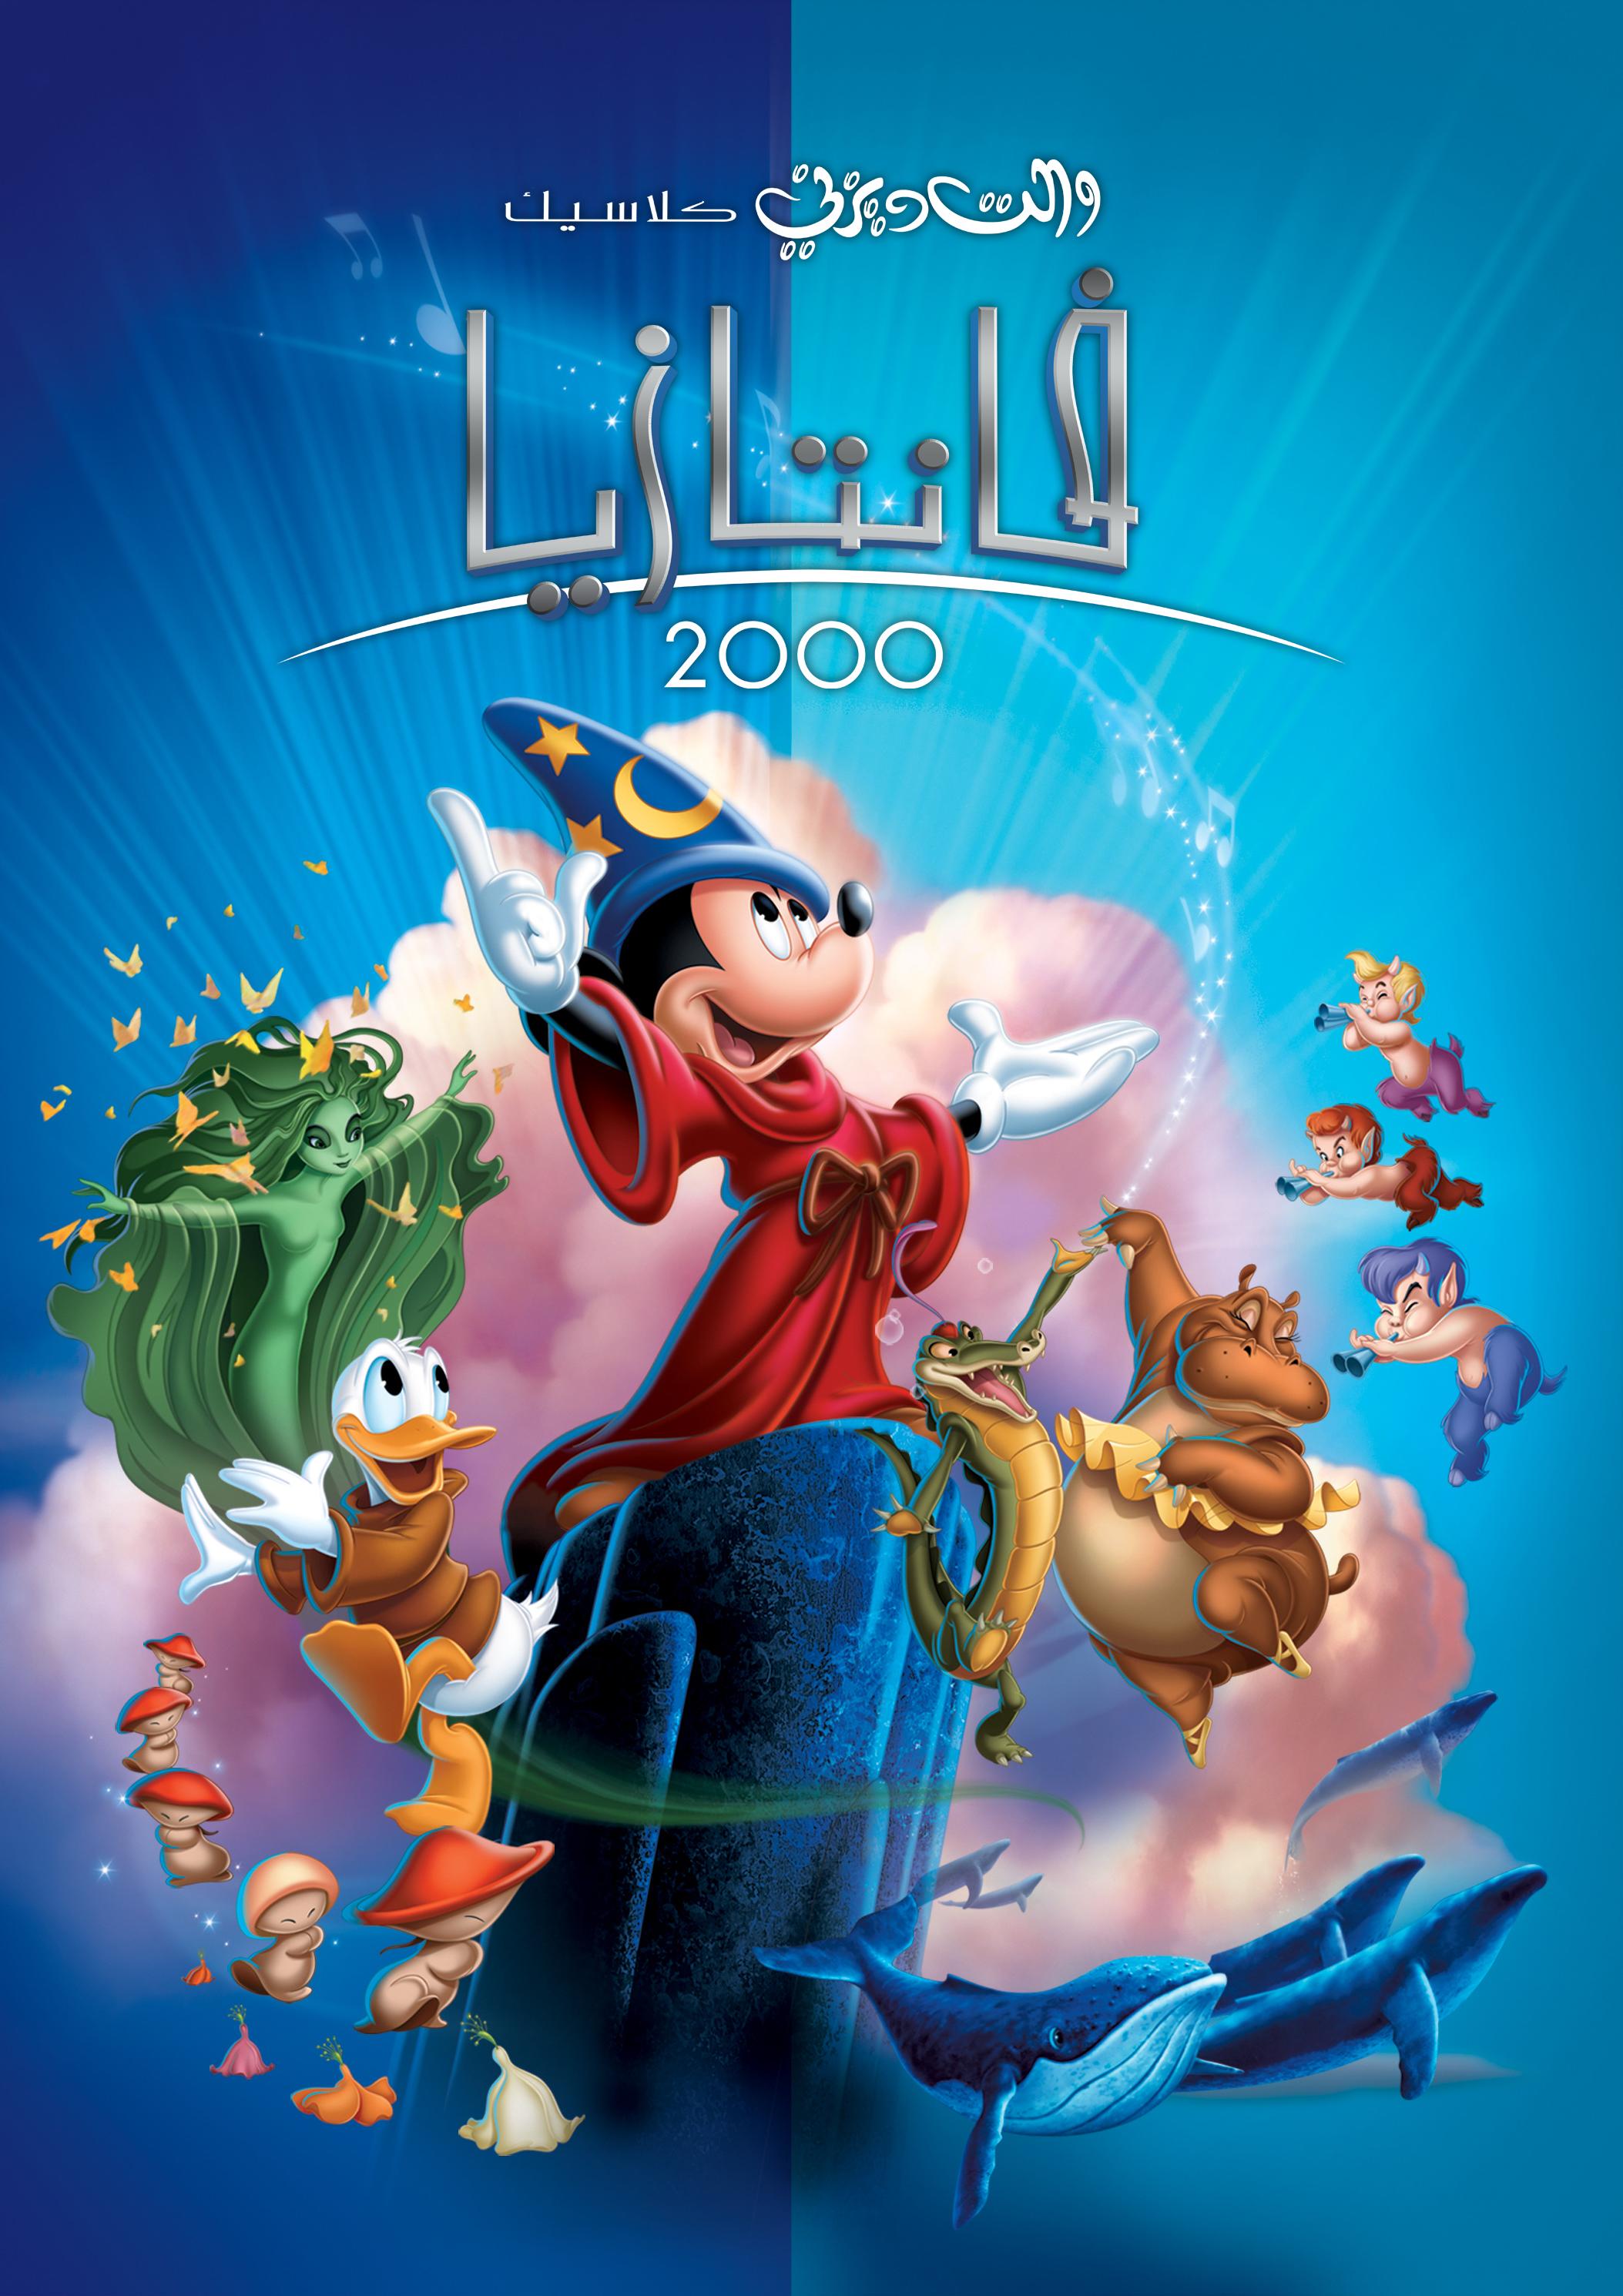 Walt Disney Posters Fantasia بوسترات ديزني2000 Walt Disney Characters Photo 38476620 Fanpop Page 7